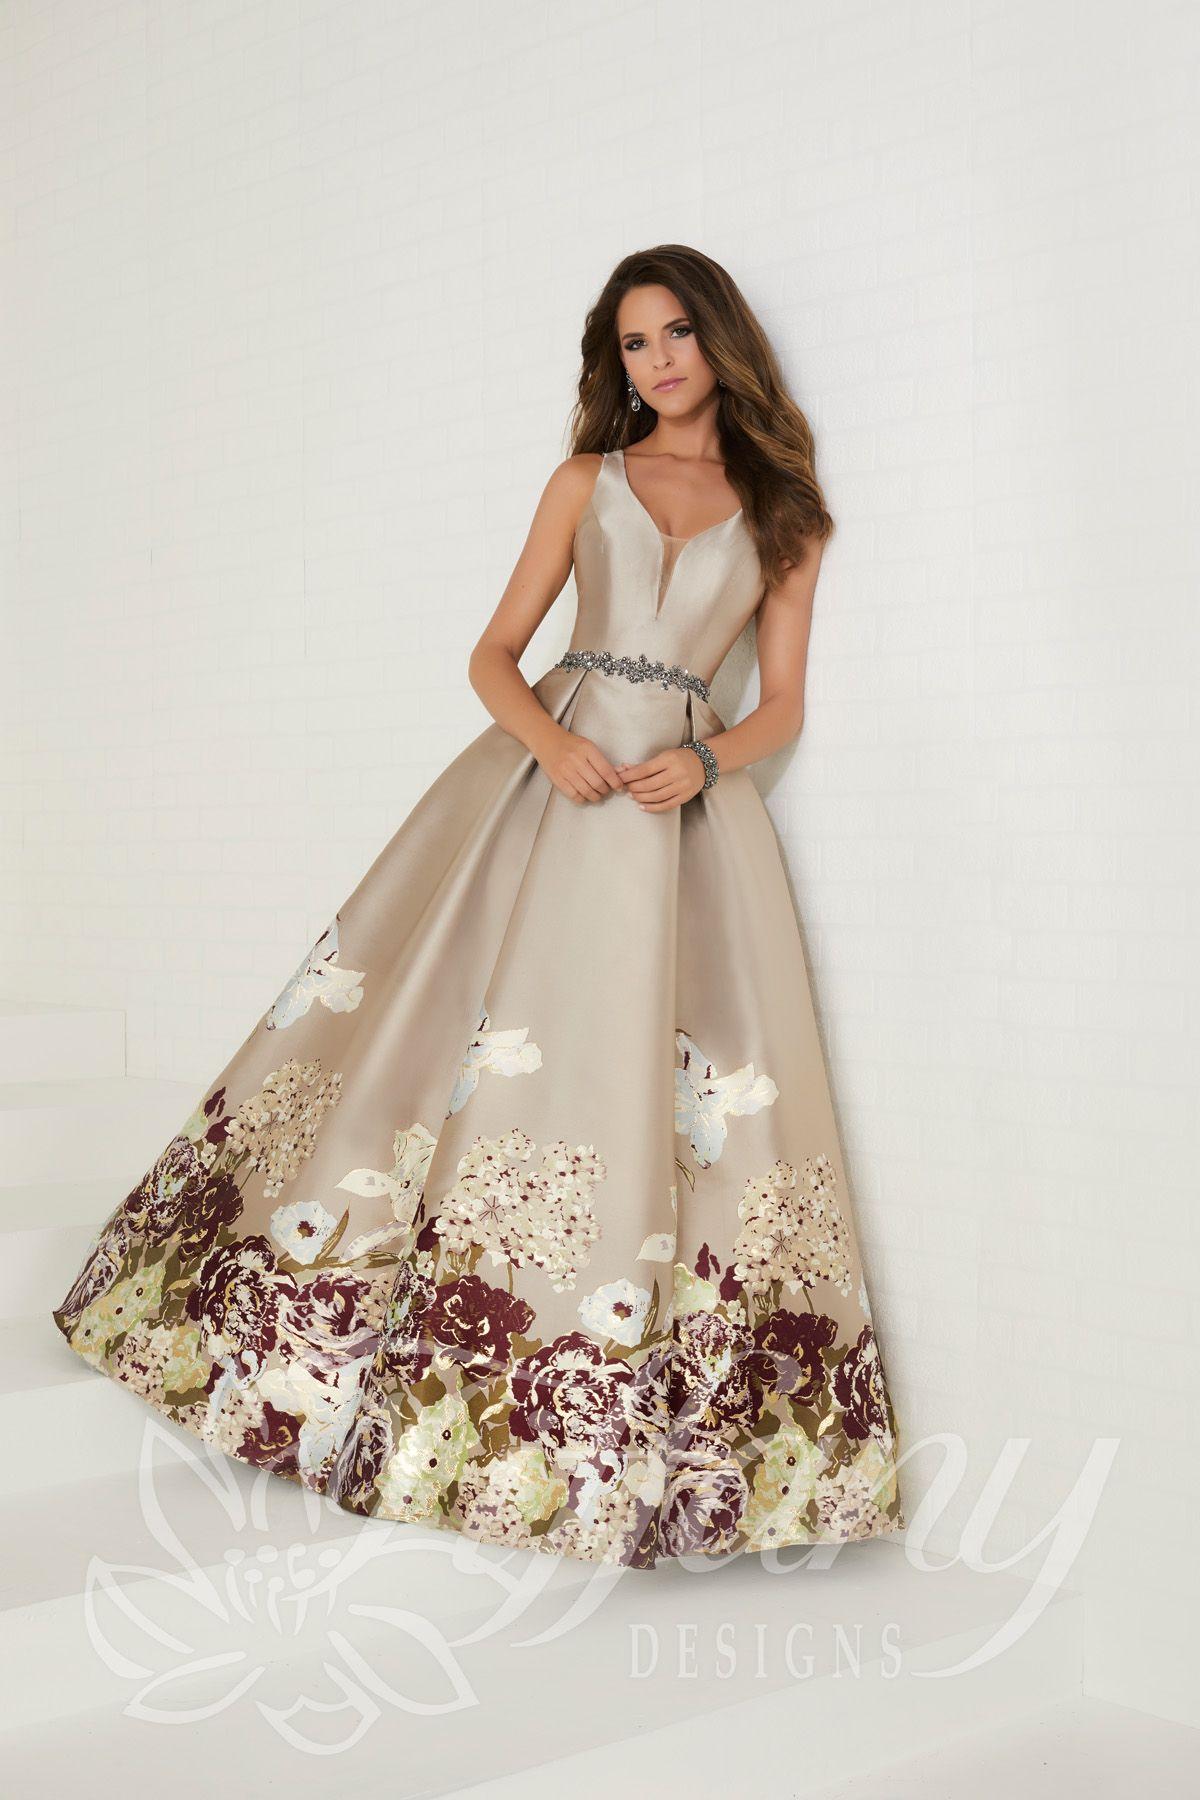 Erfreut Prom Dresses South Bend Indiana Galerie - Brautkleider Ideen ...